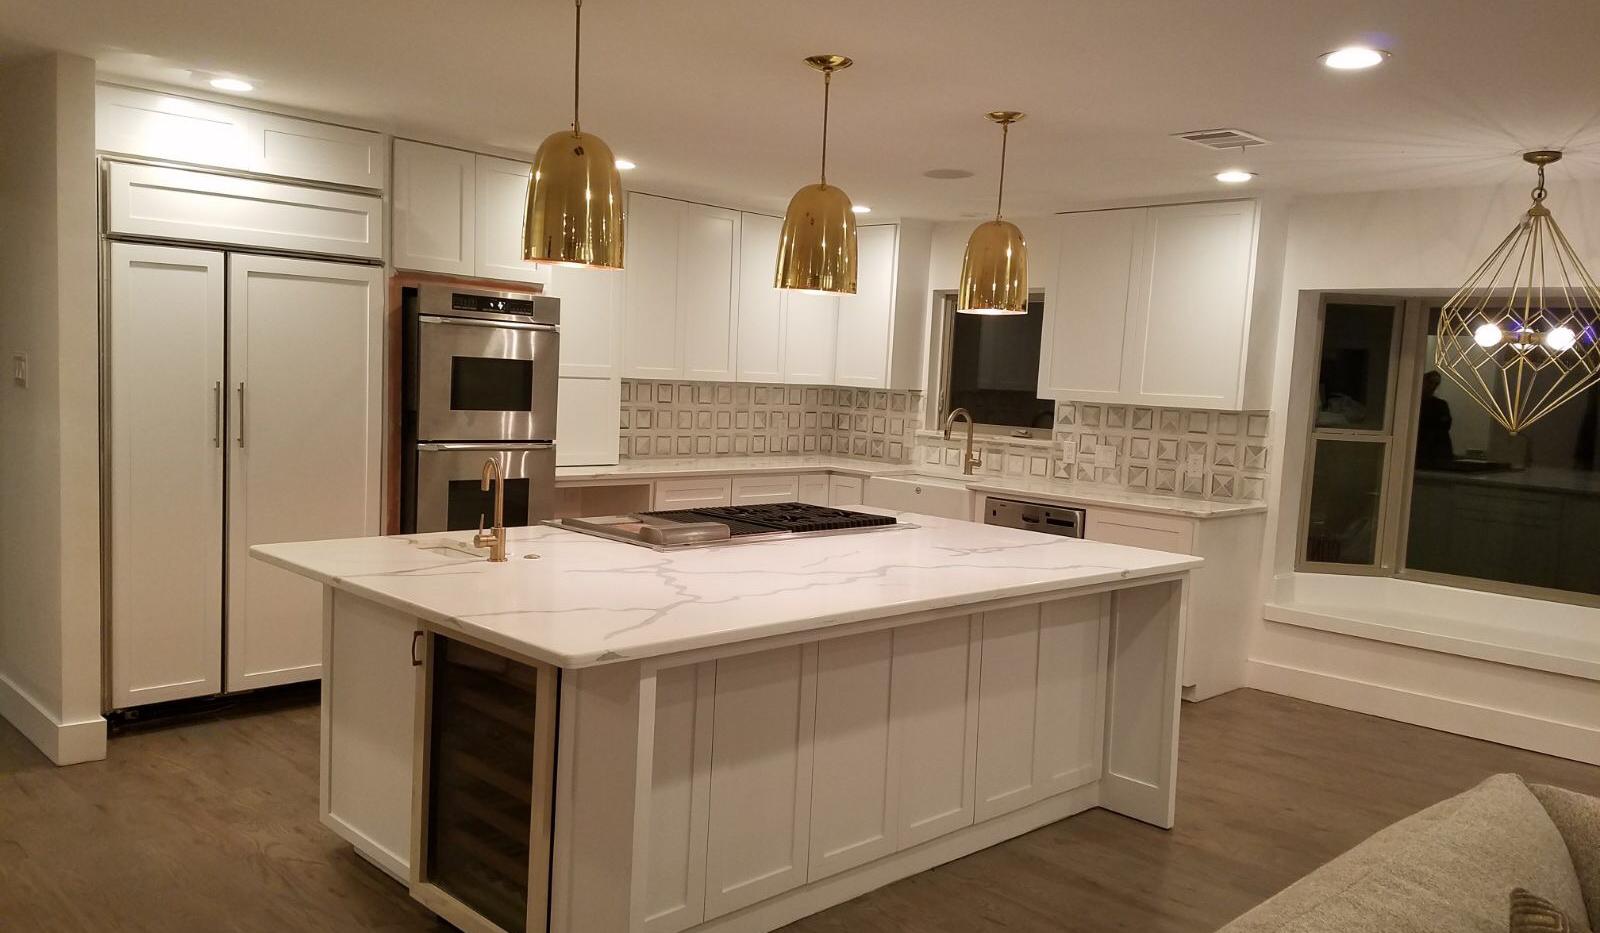 White quartz kitchen with gold accents.p